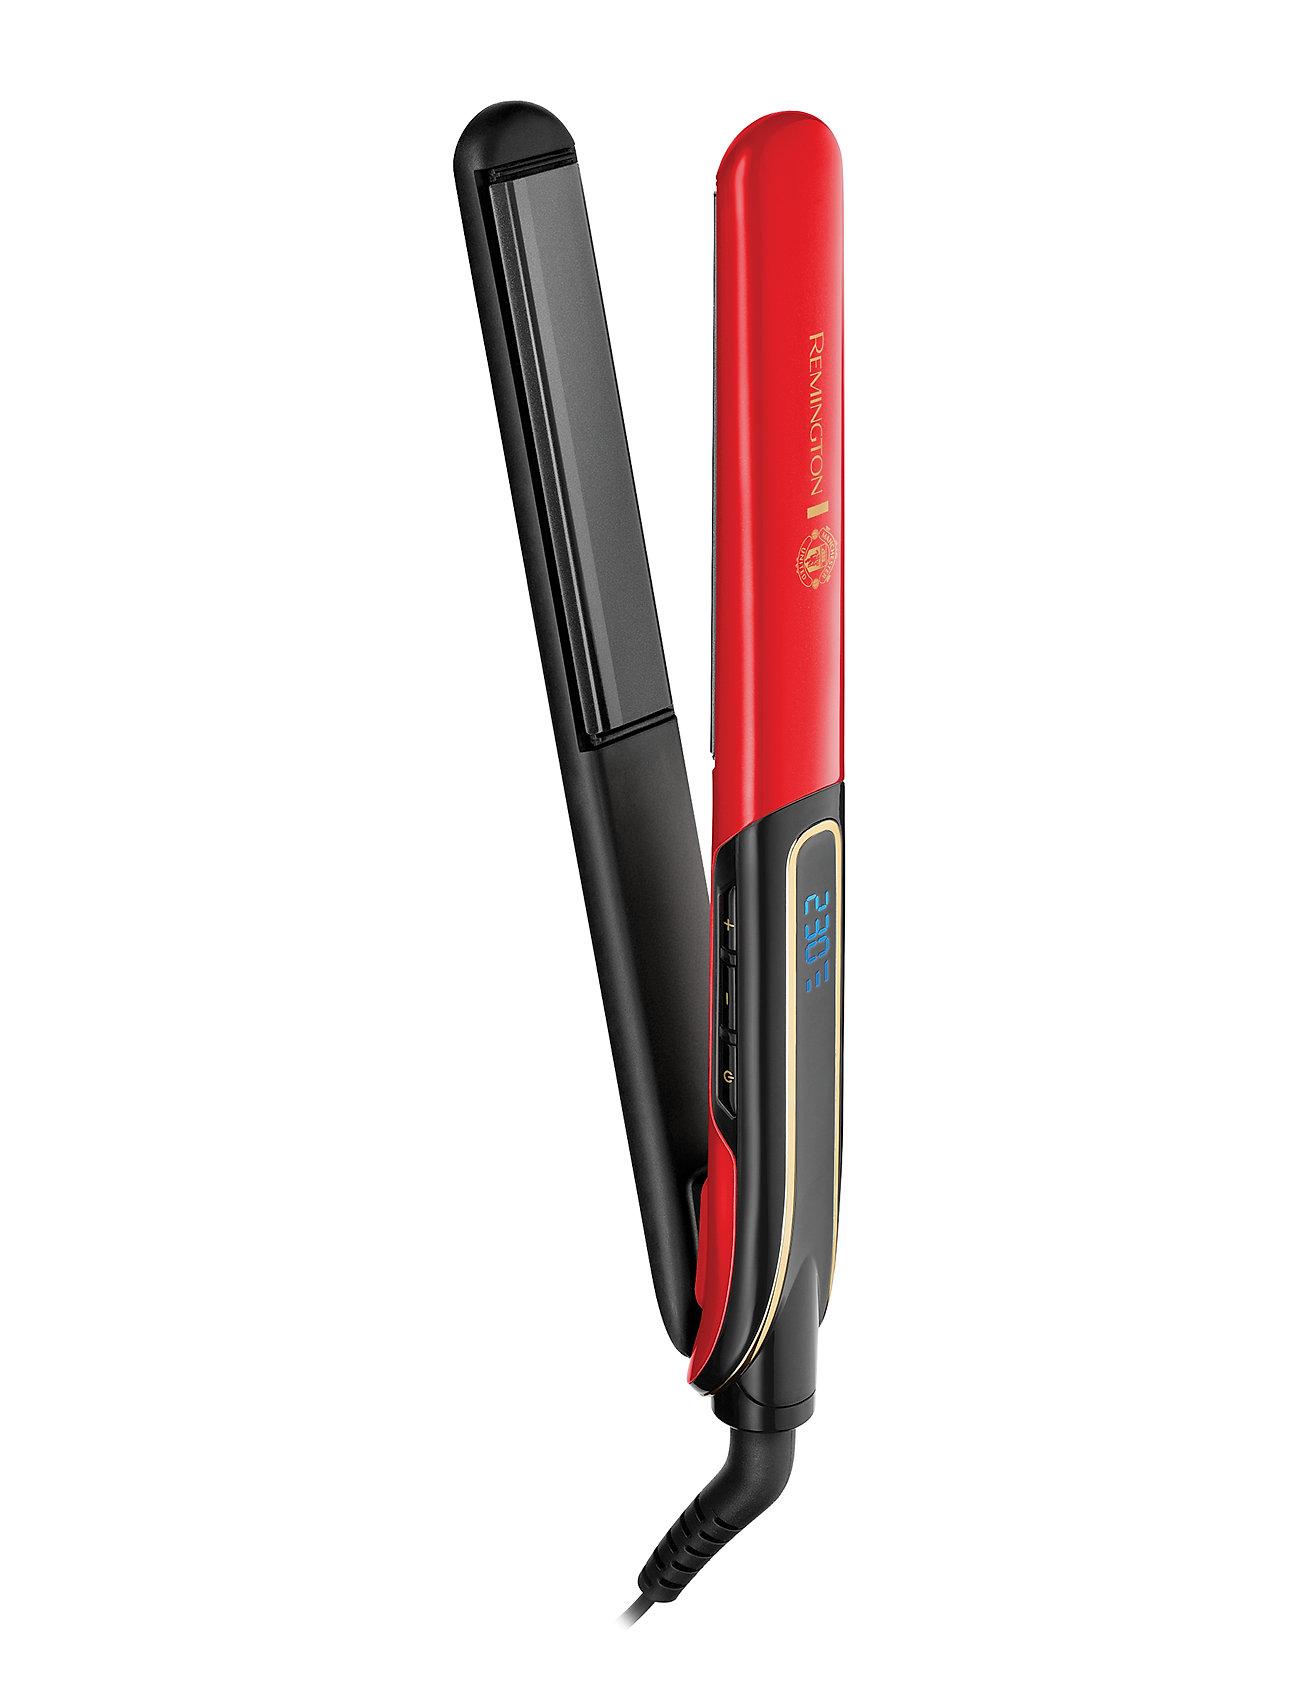 Remington S6755 Man Utd Sleek & CurlExp Straight - NO COLOR